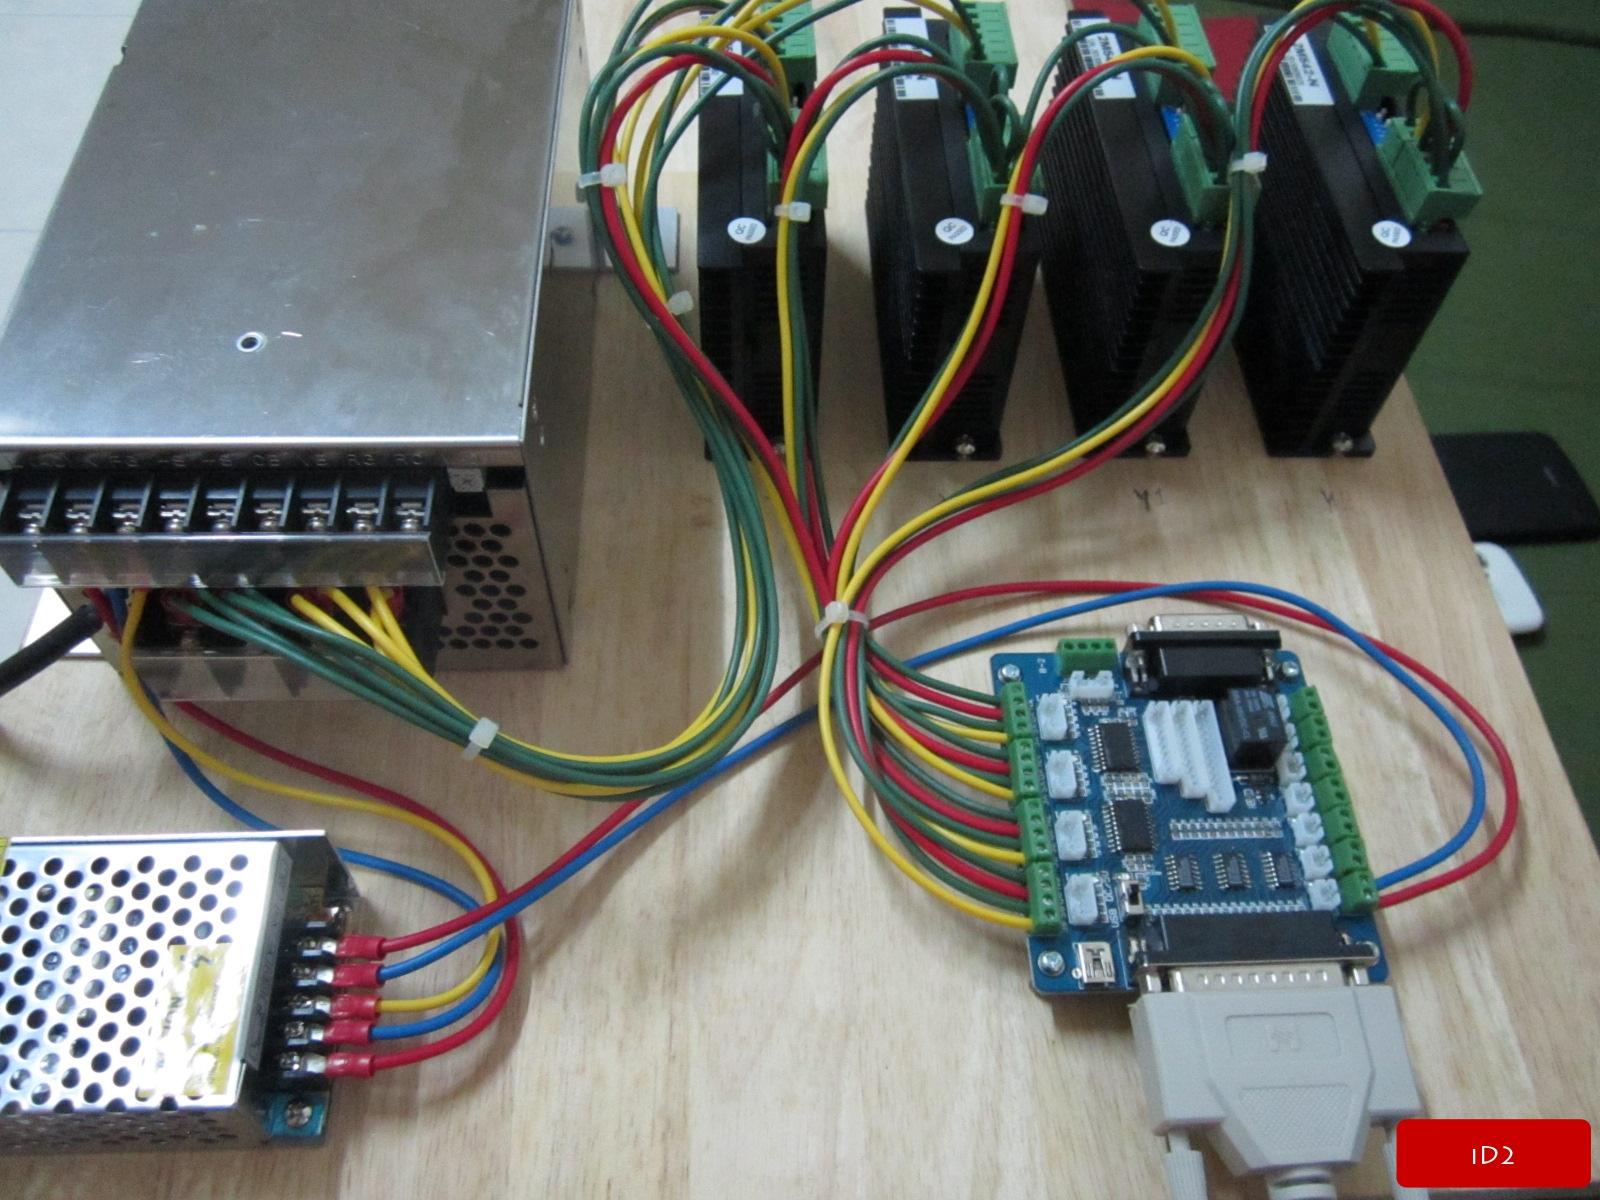 draft] cnc electronic wiring \u2013 id2cnc Smart Home Wiring Diagram